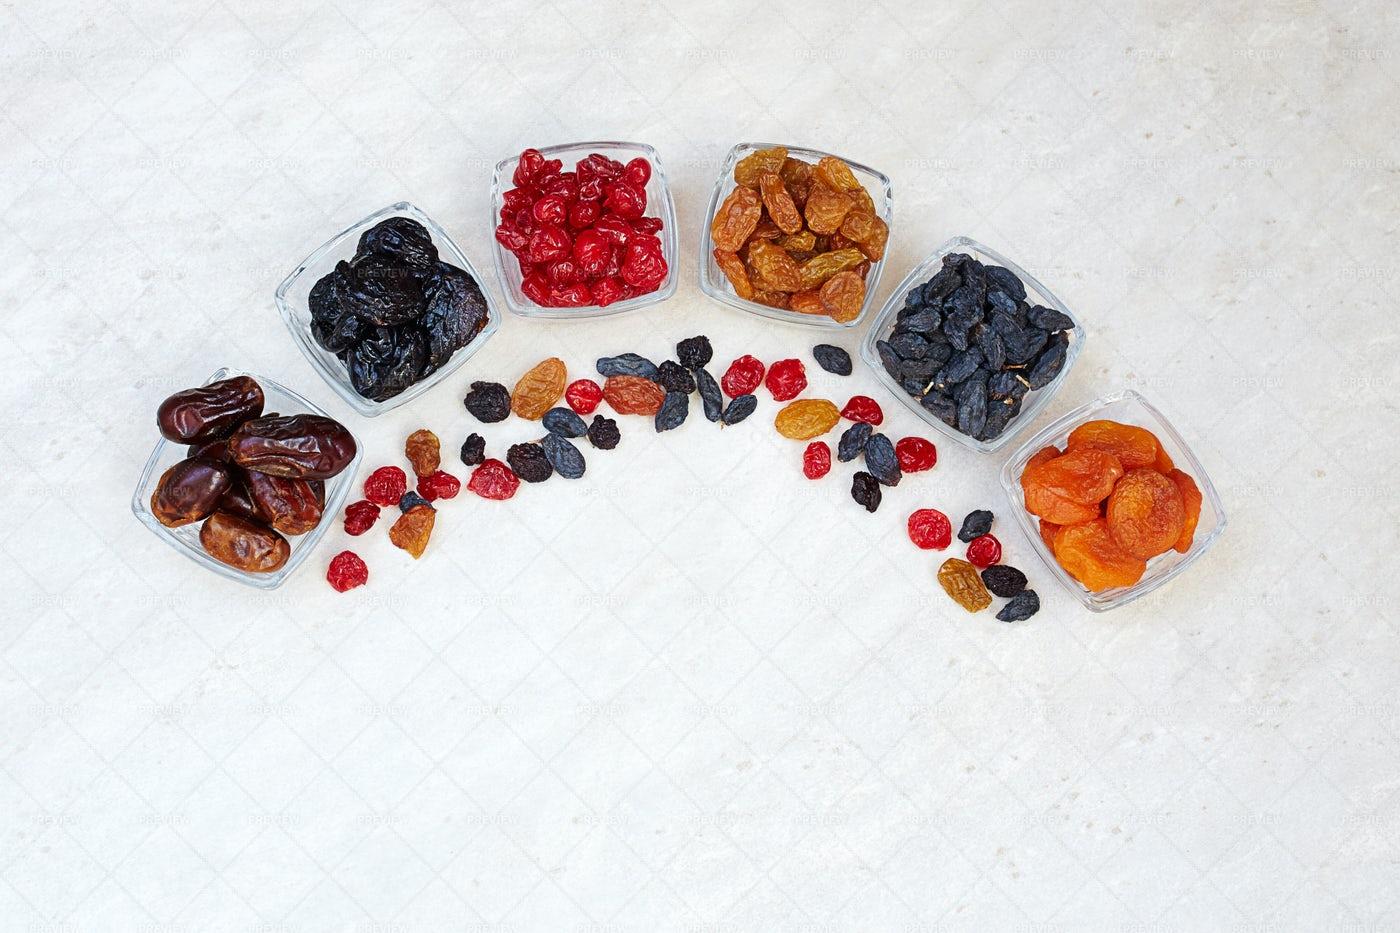 Prunes, Raisins, Dates: Stock Photos